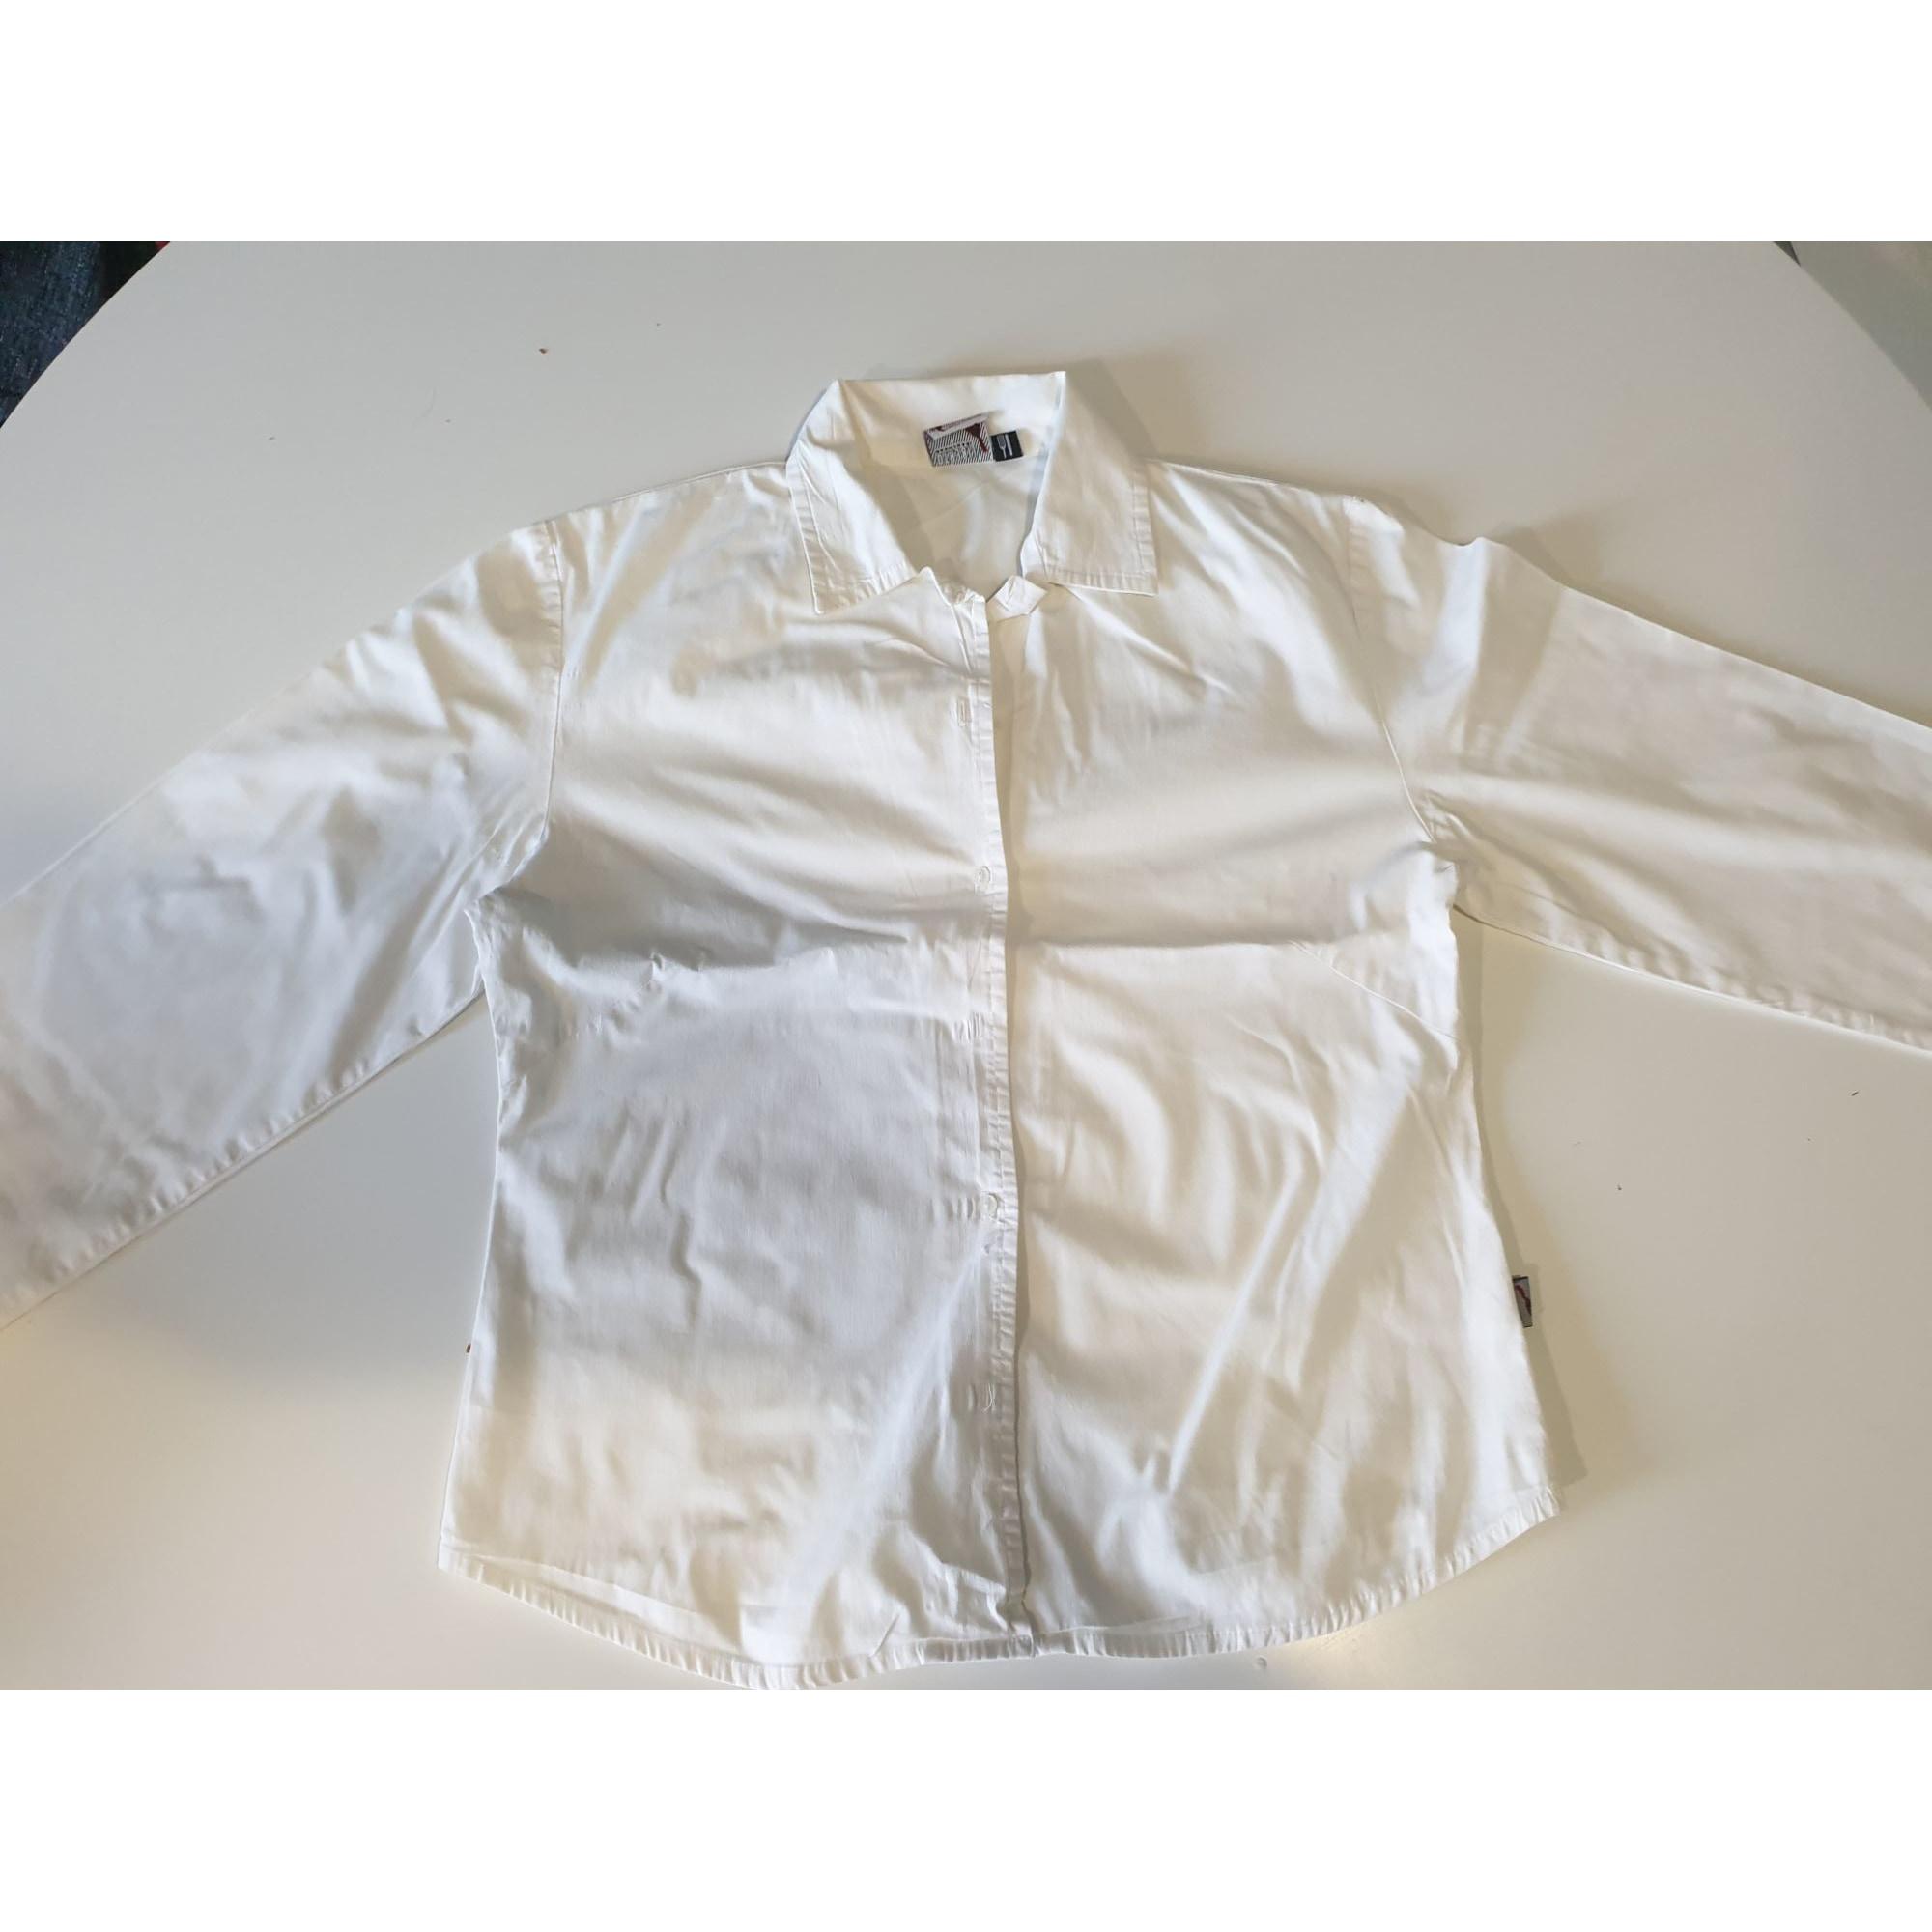 Chemisier LIBERTO Blanc, blanc cassé, écru